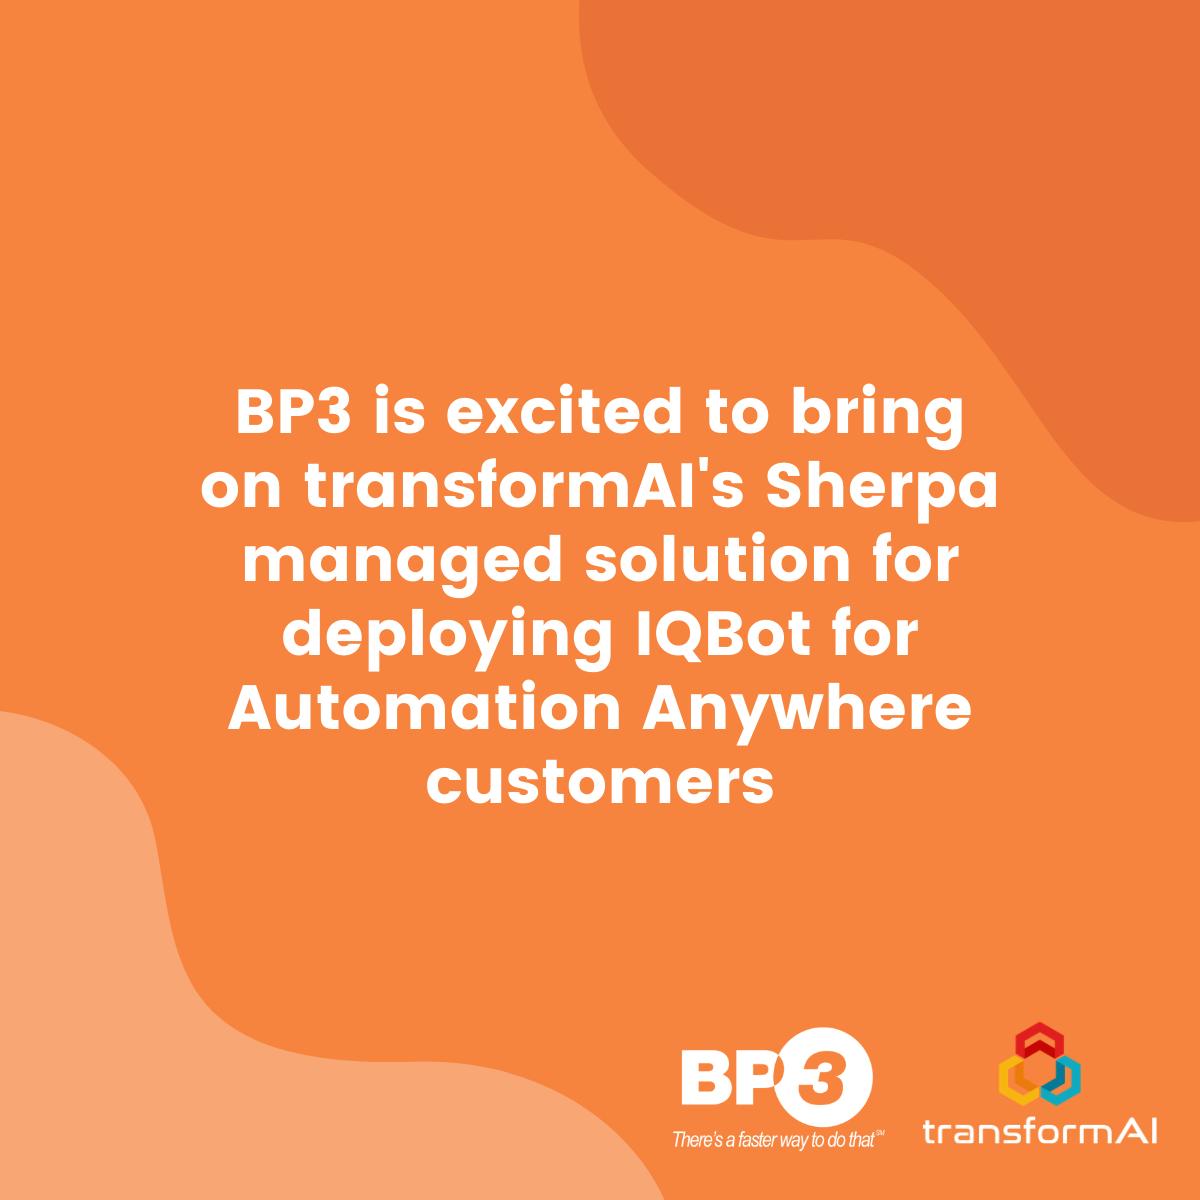 BP3 Global transformAI IQBot announcement image